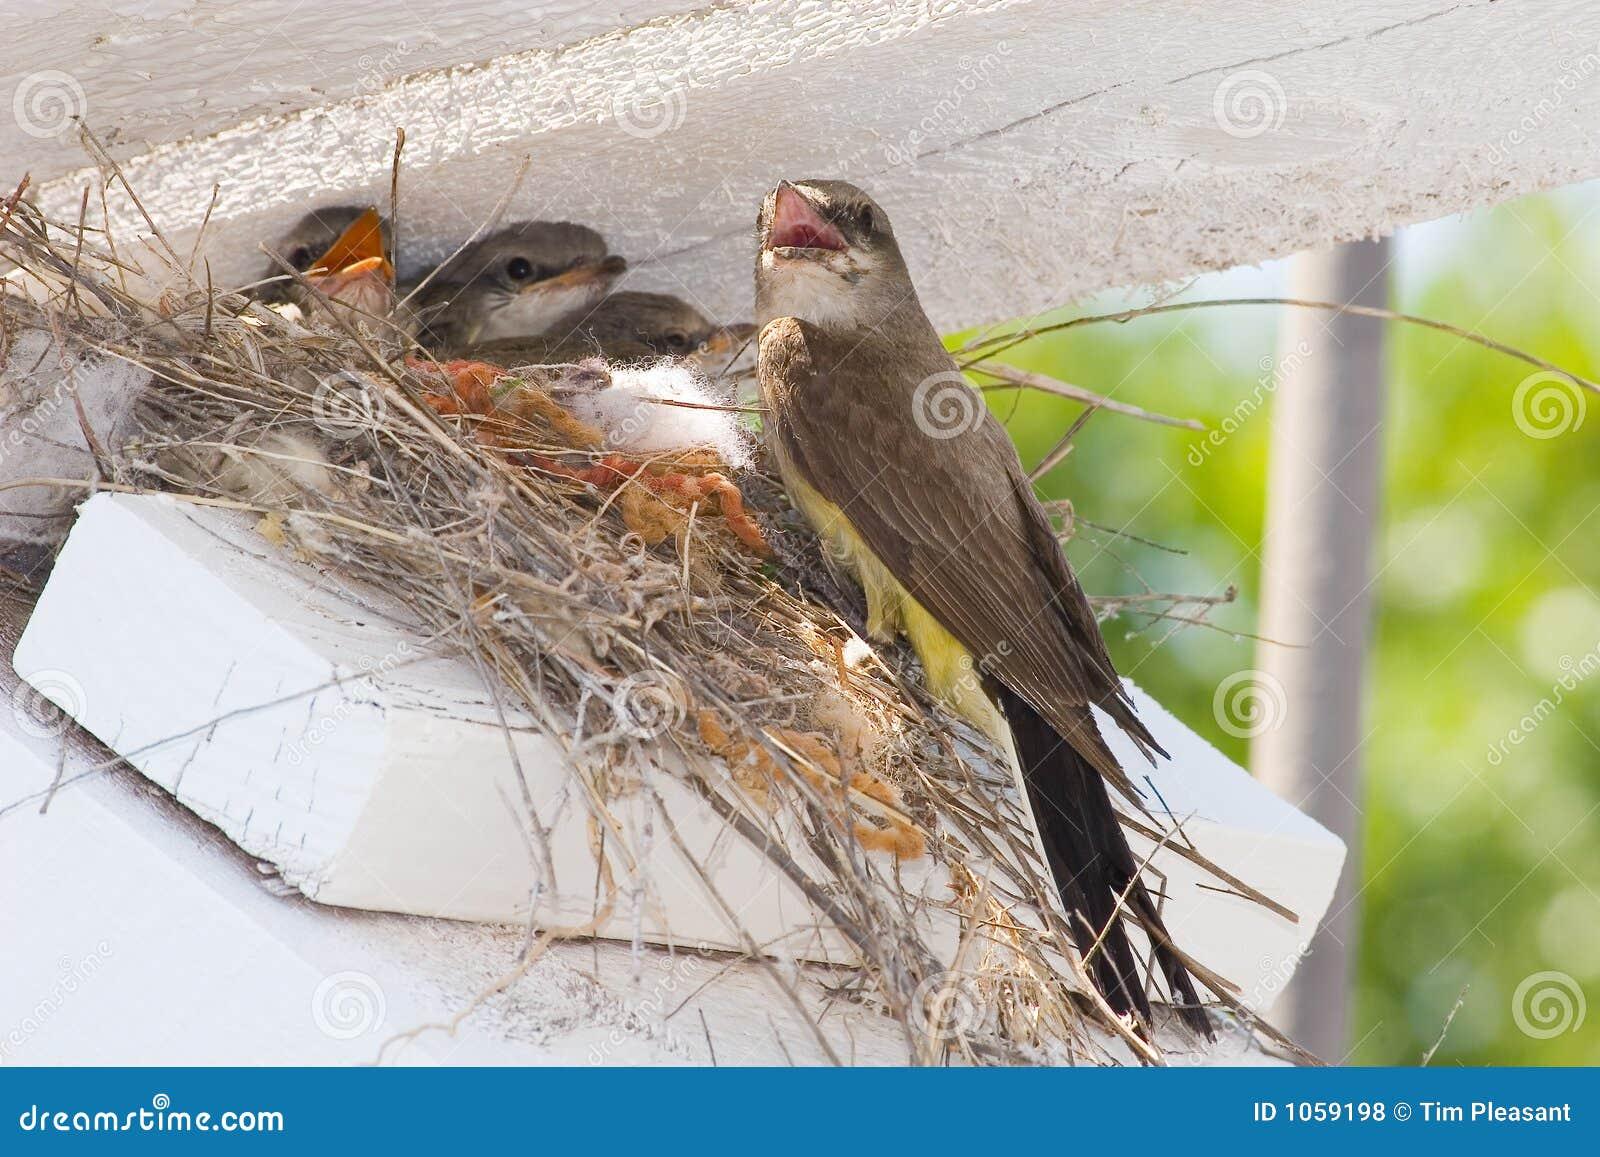 Kingbird baby